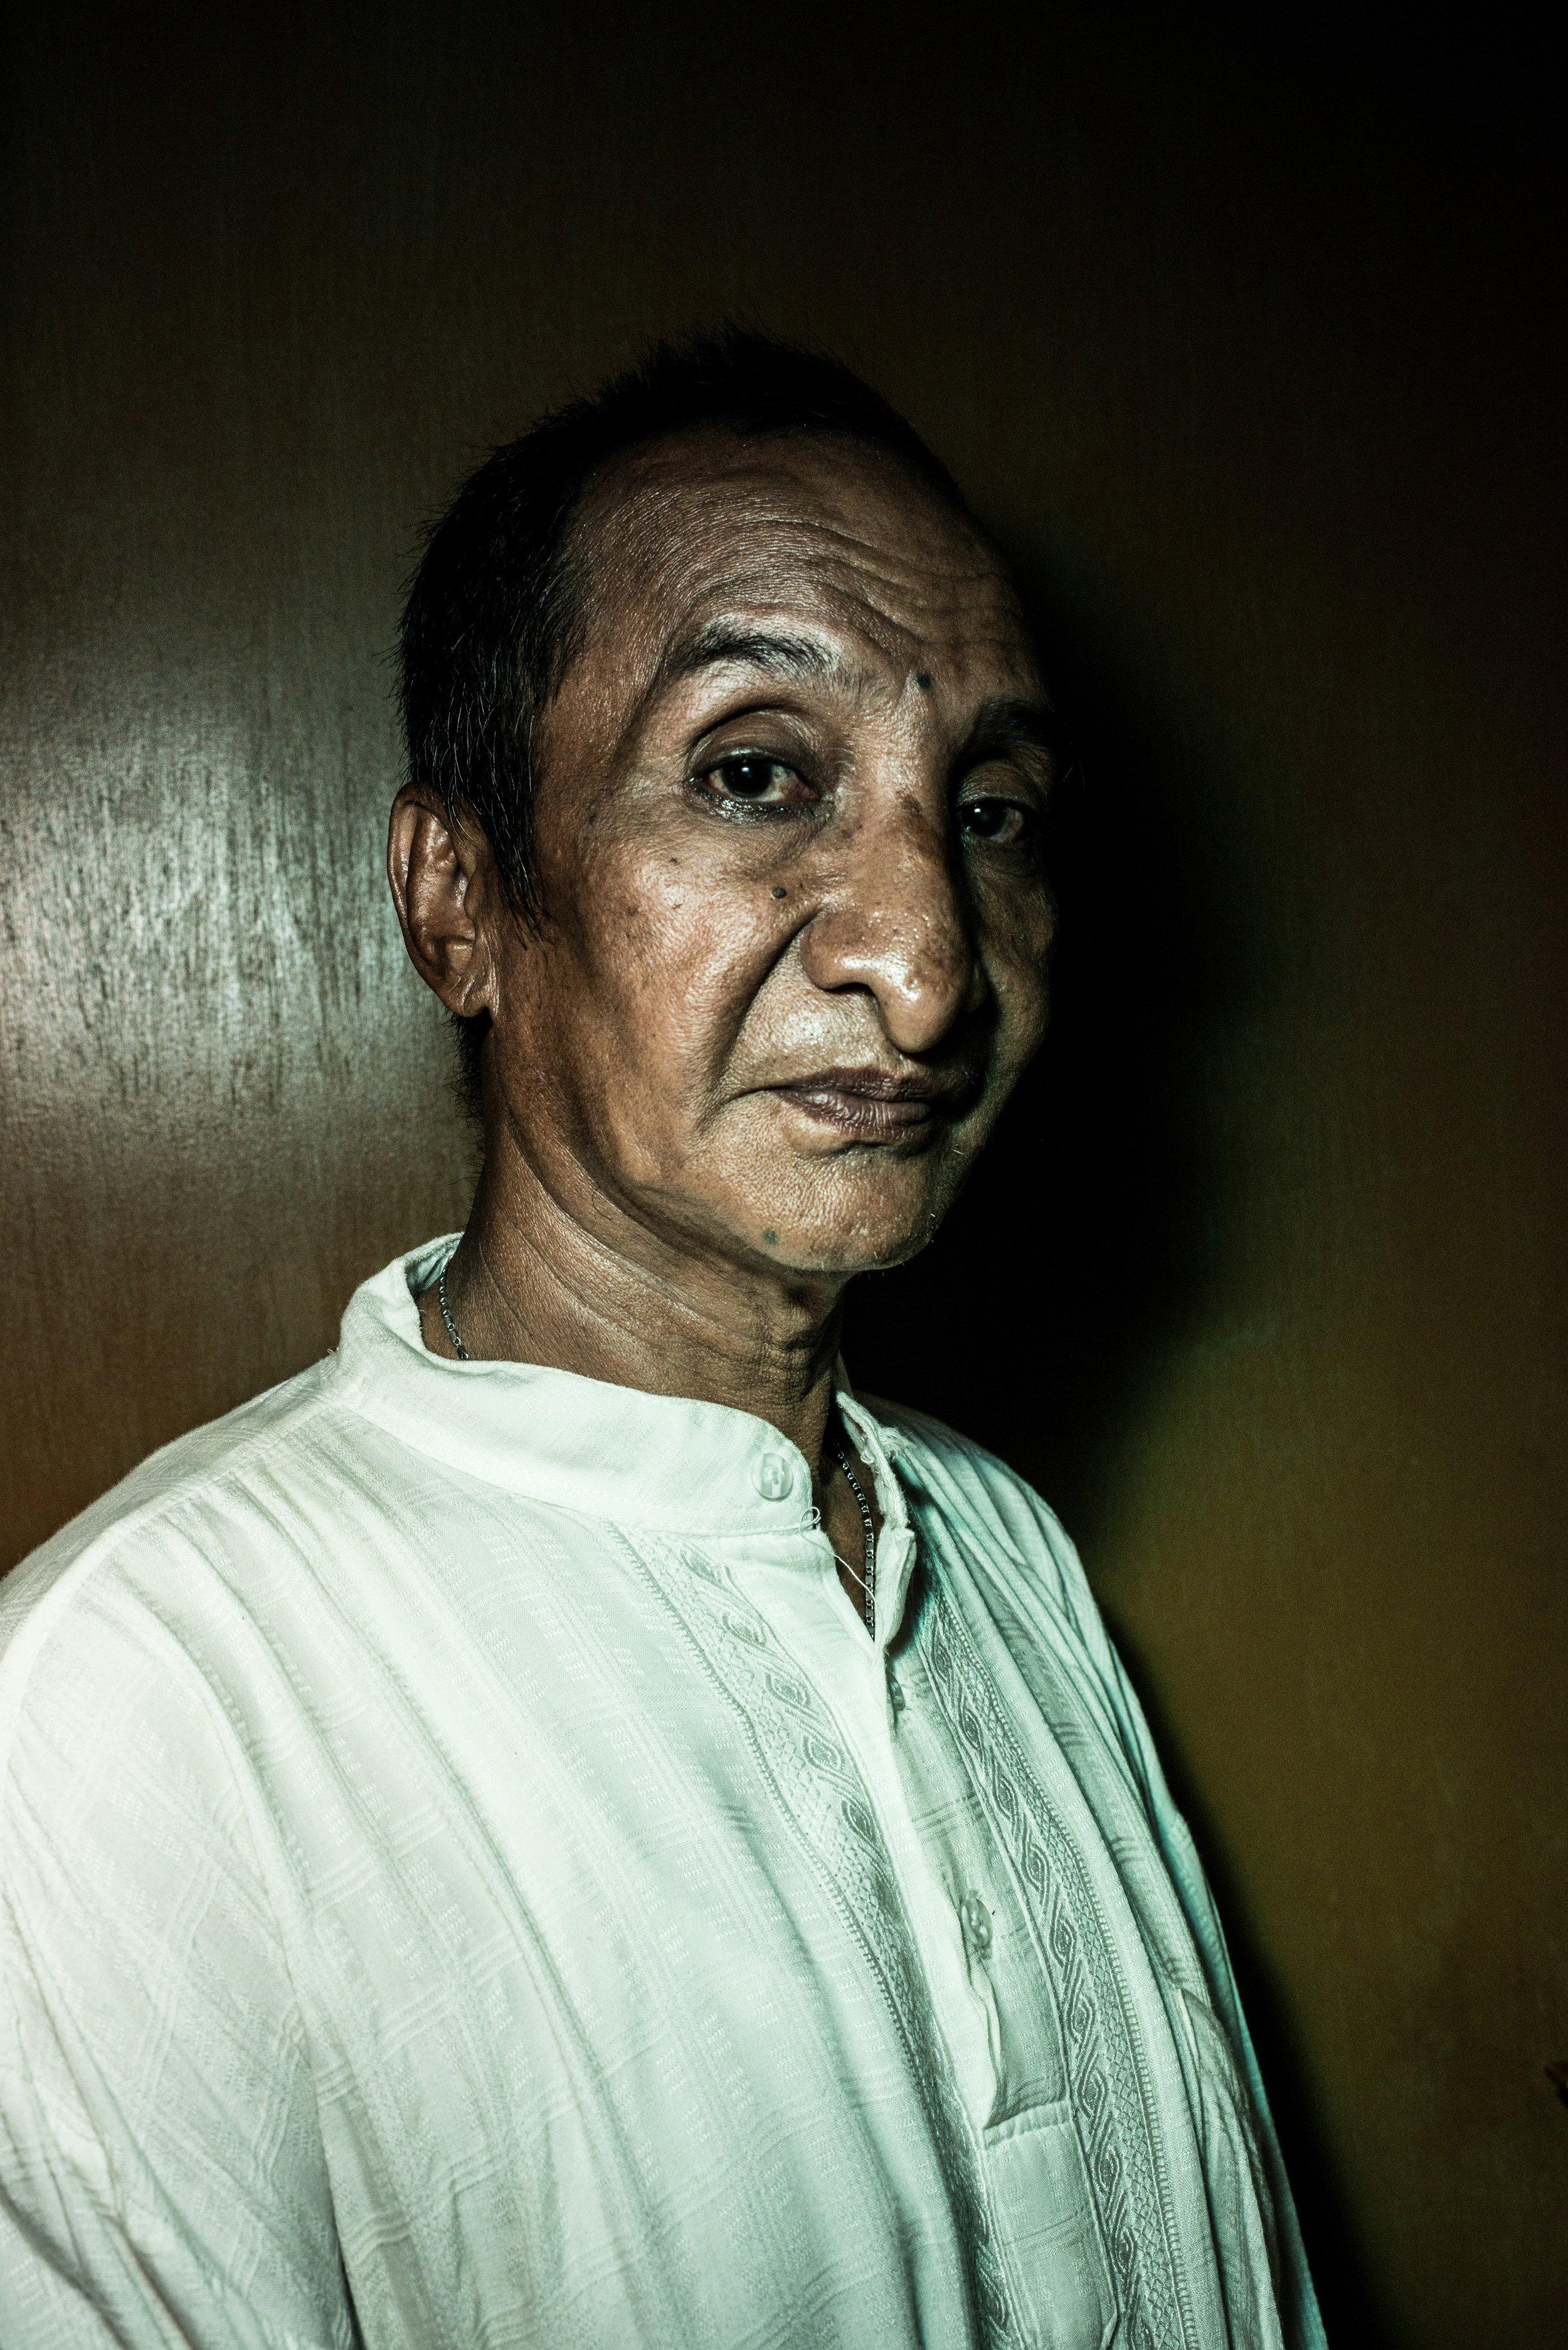 Darmi, 63 years old. Jakarta, 2013.